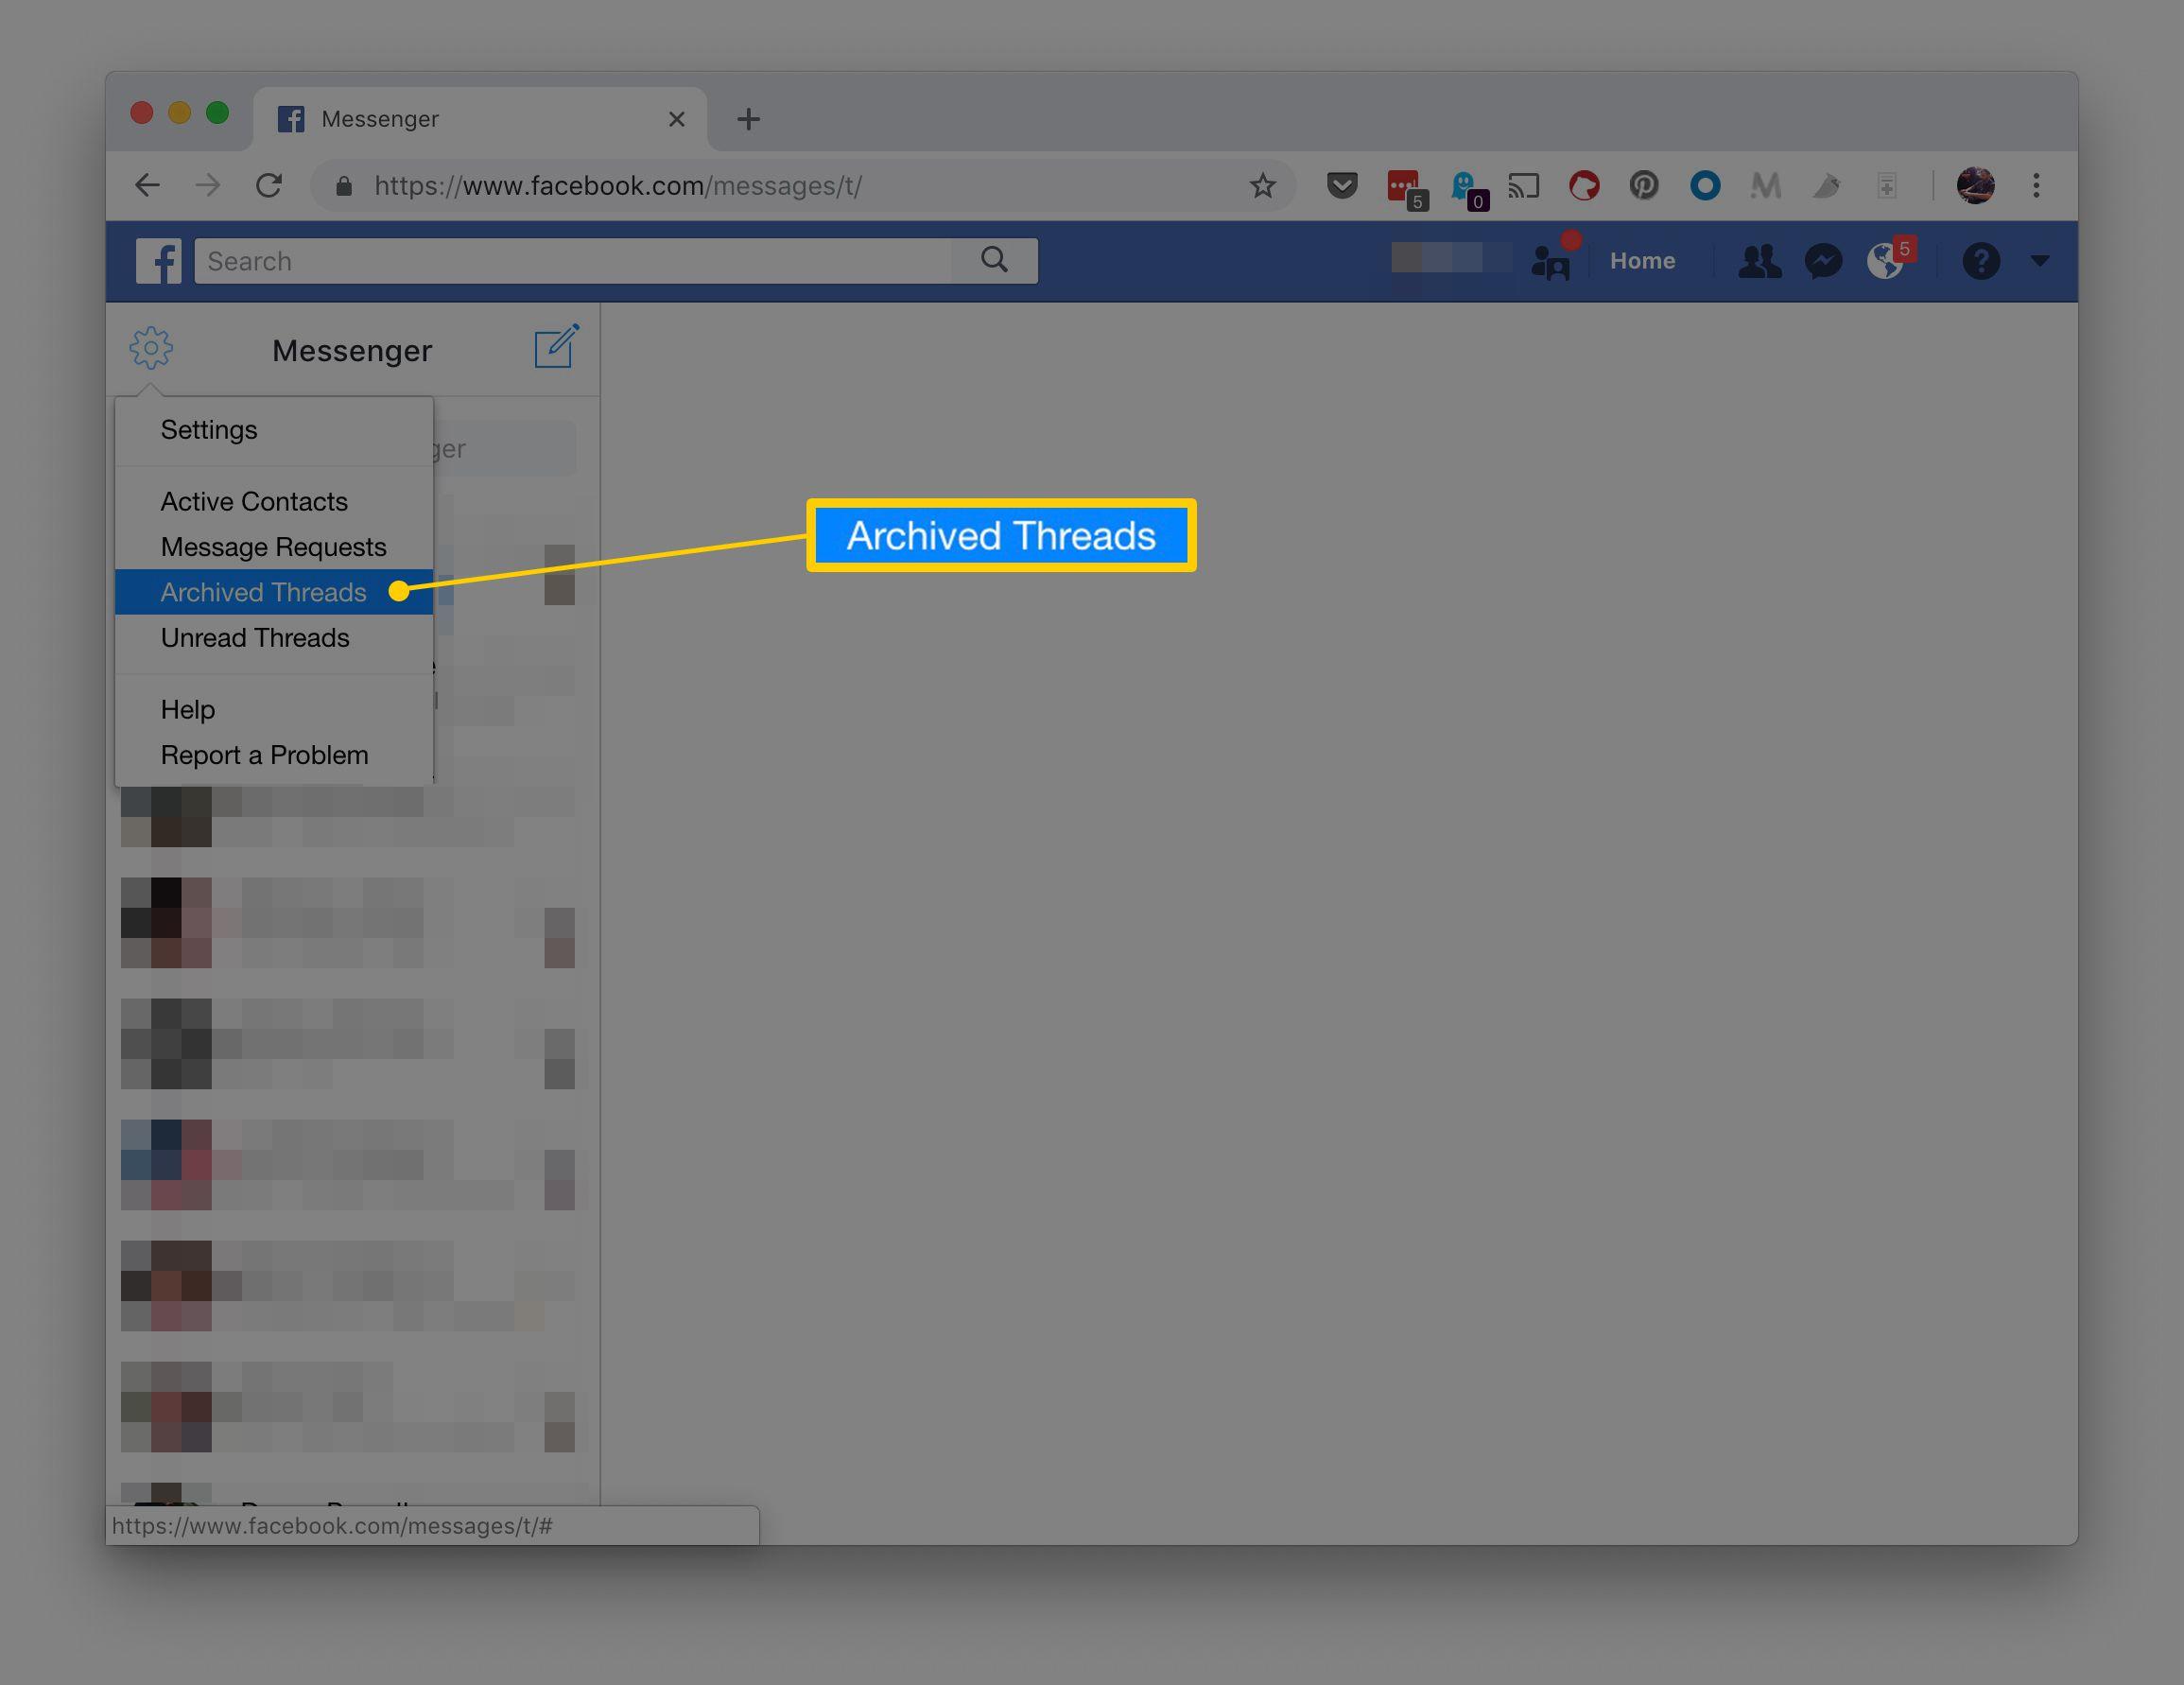 m facebook com messages